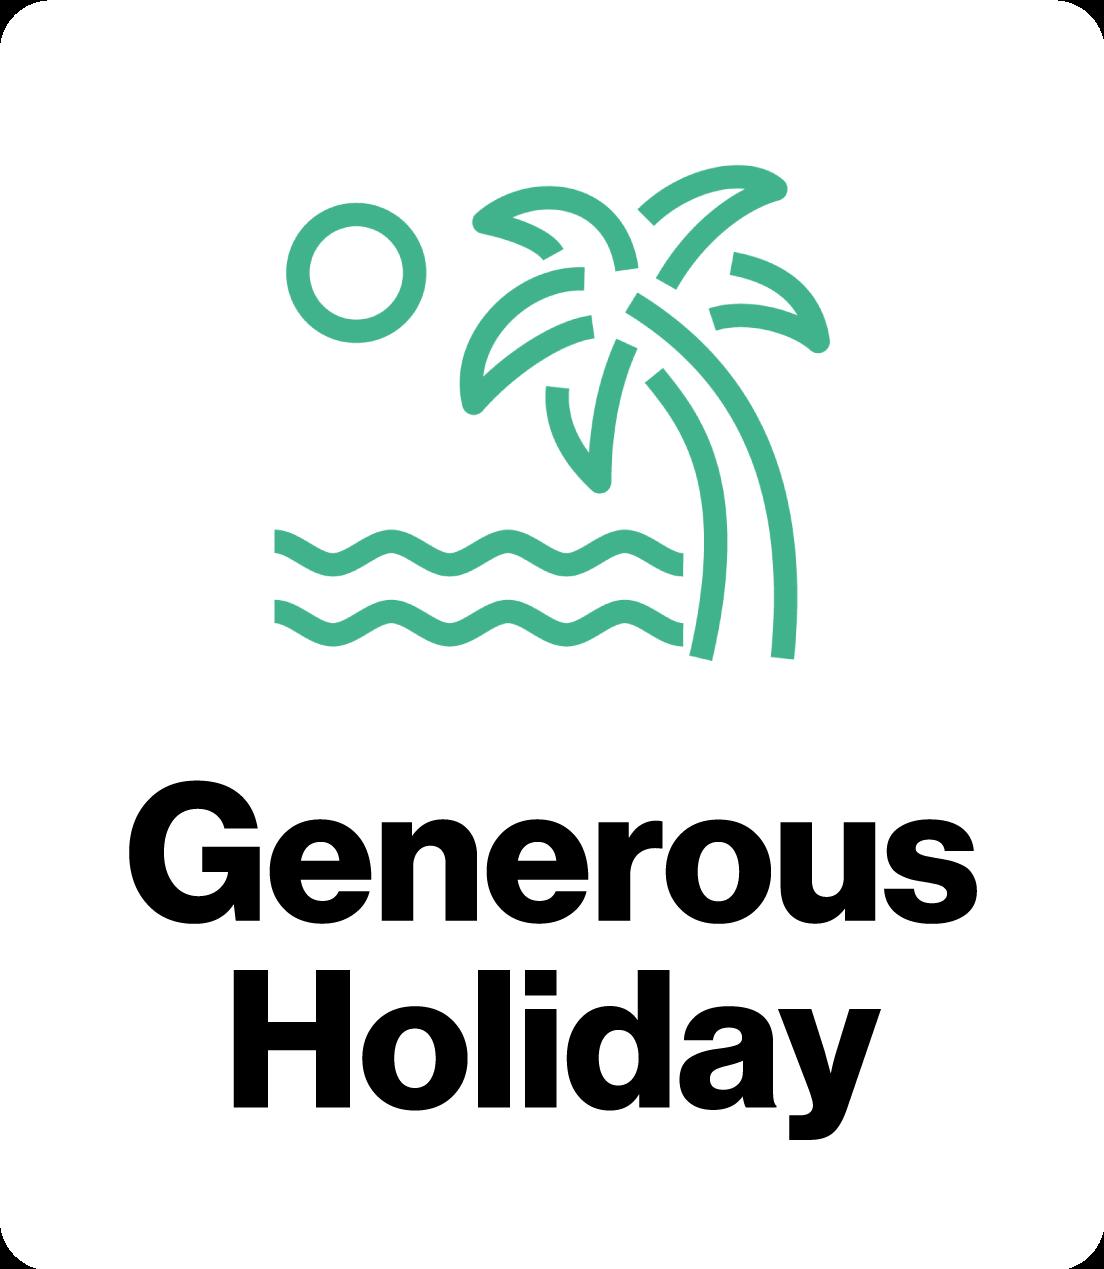 Generous Holiday